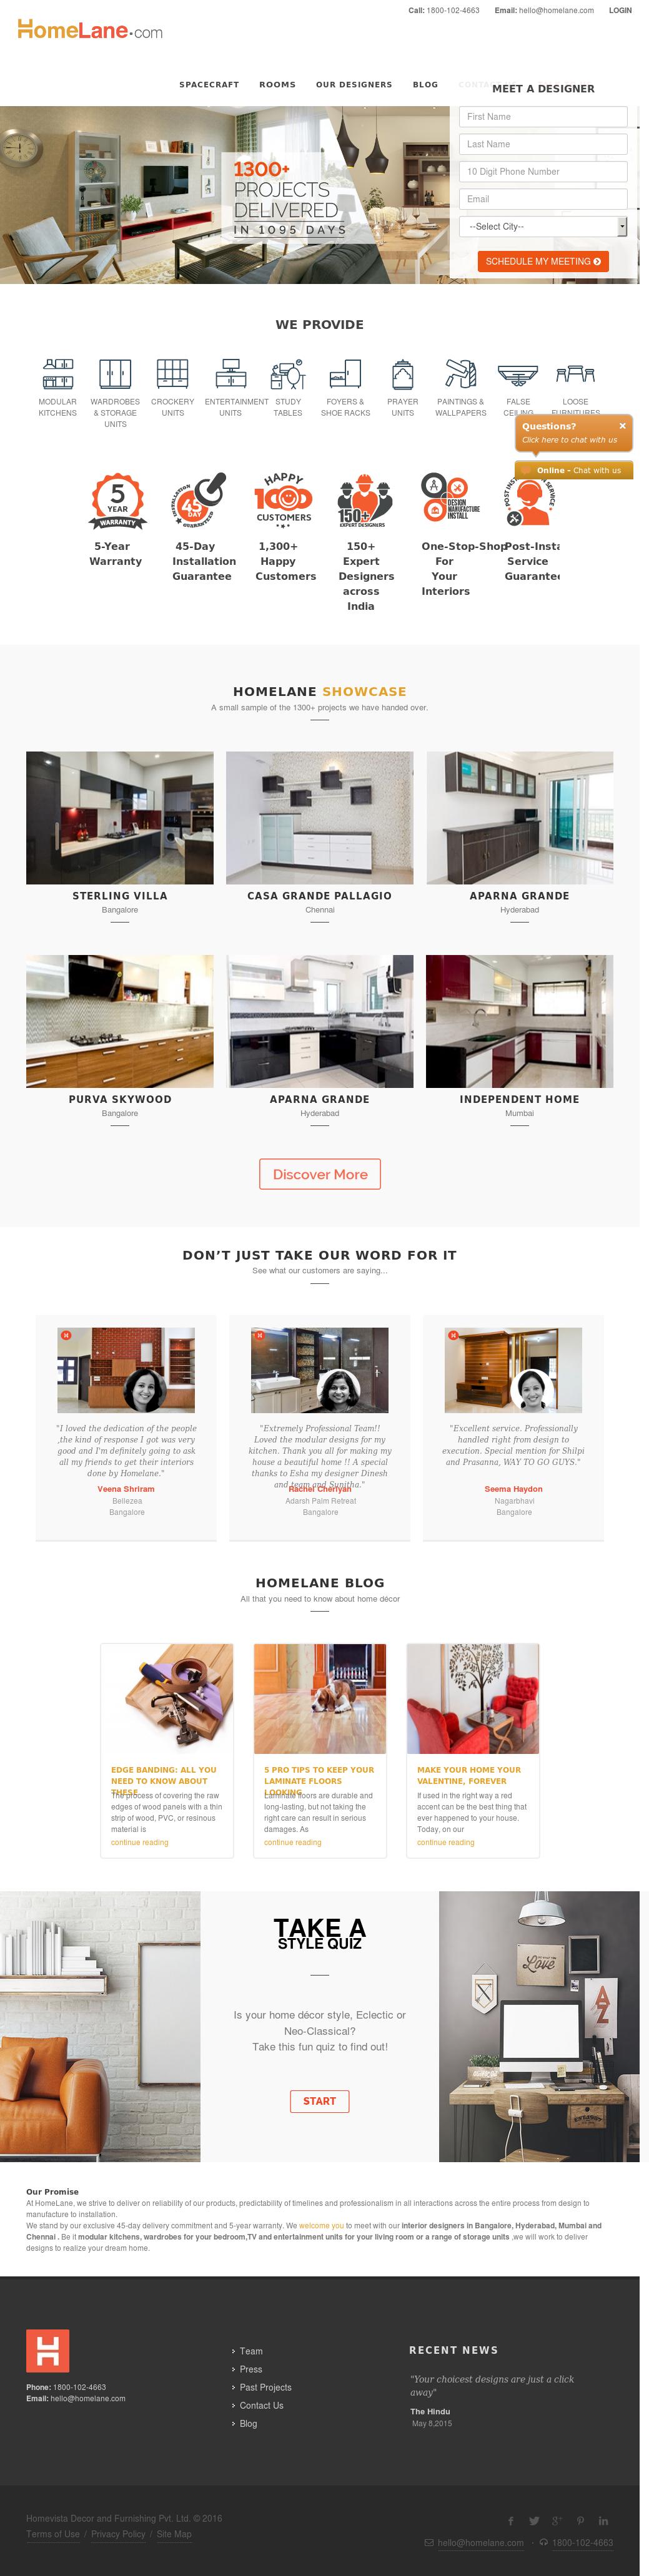 HomeLane Competitors, Revenue and Employees - Owler Company Profile